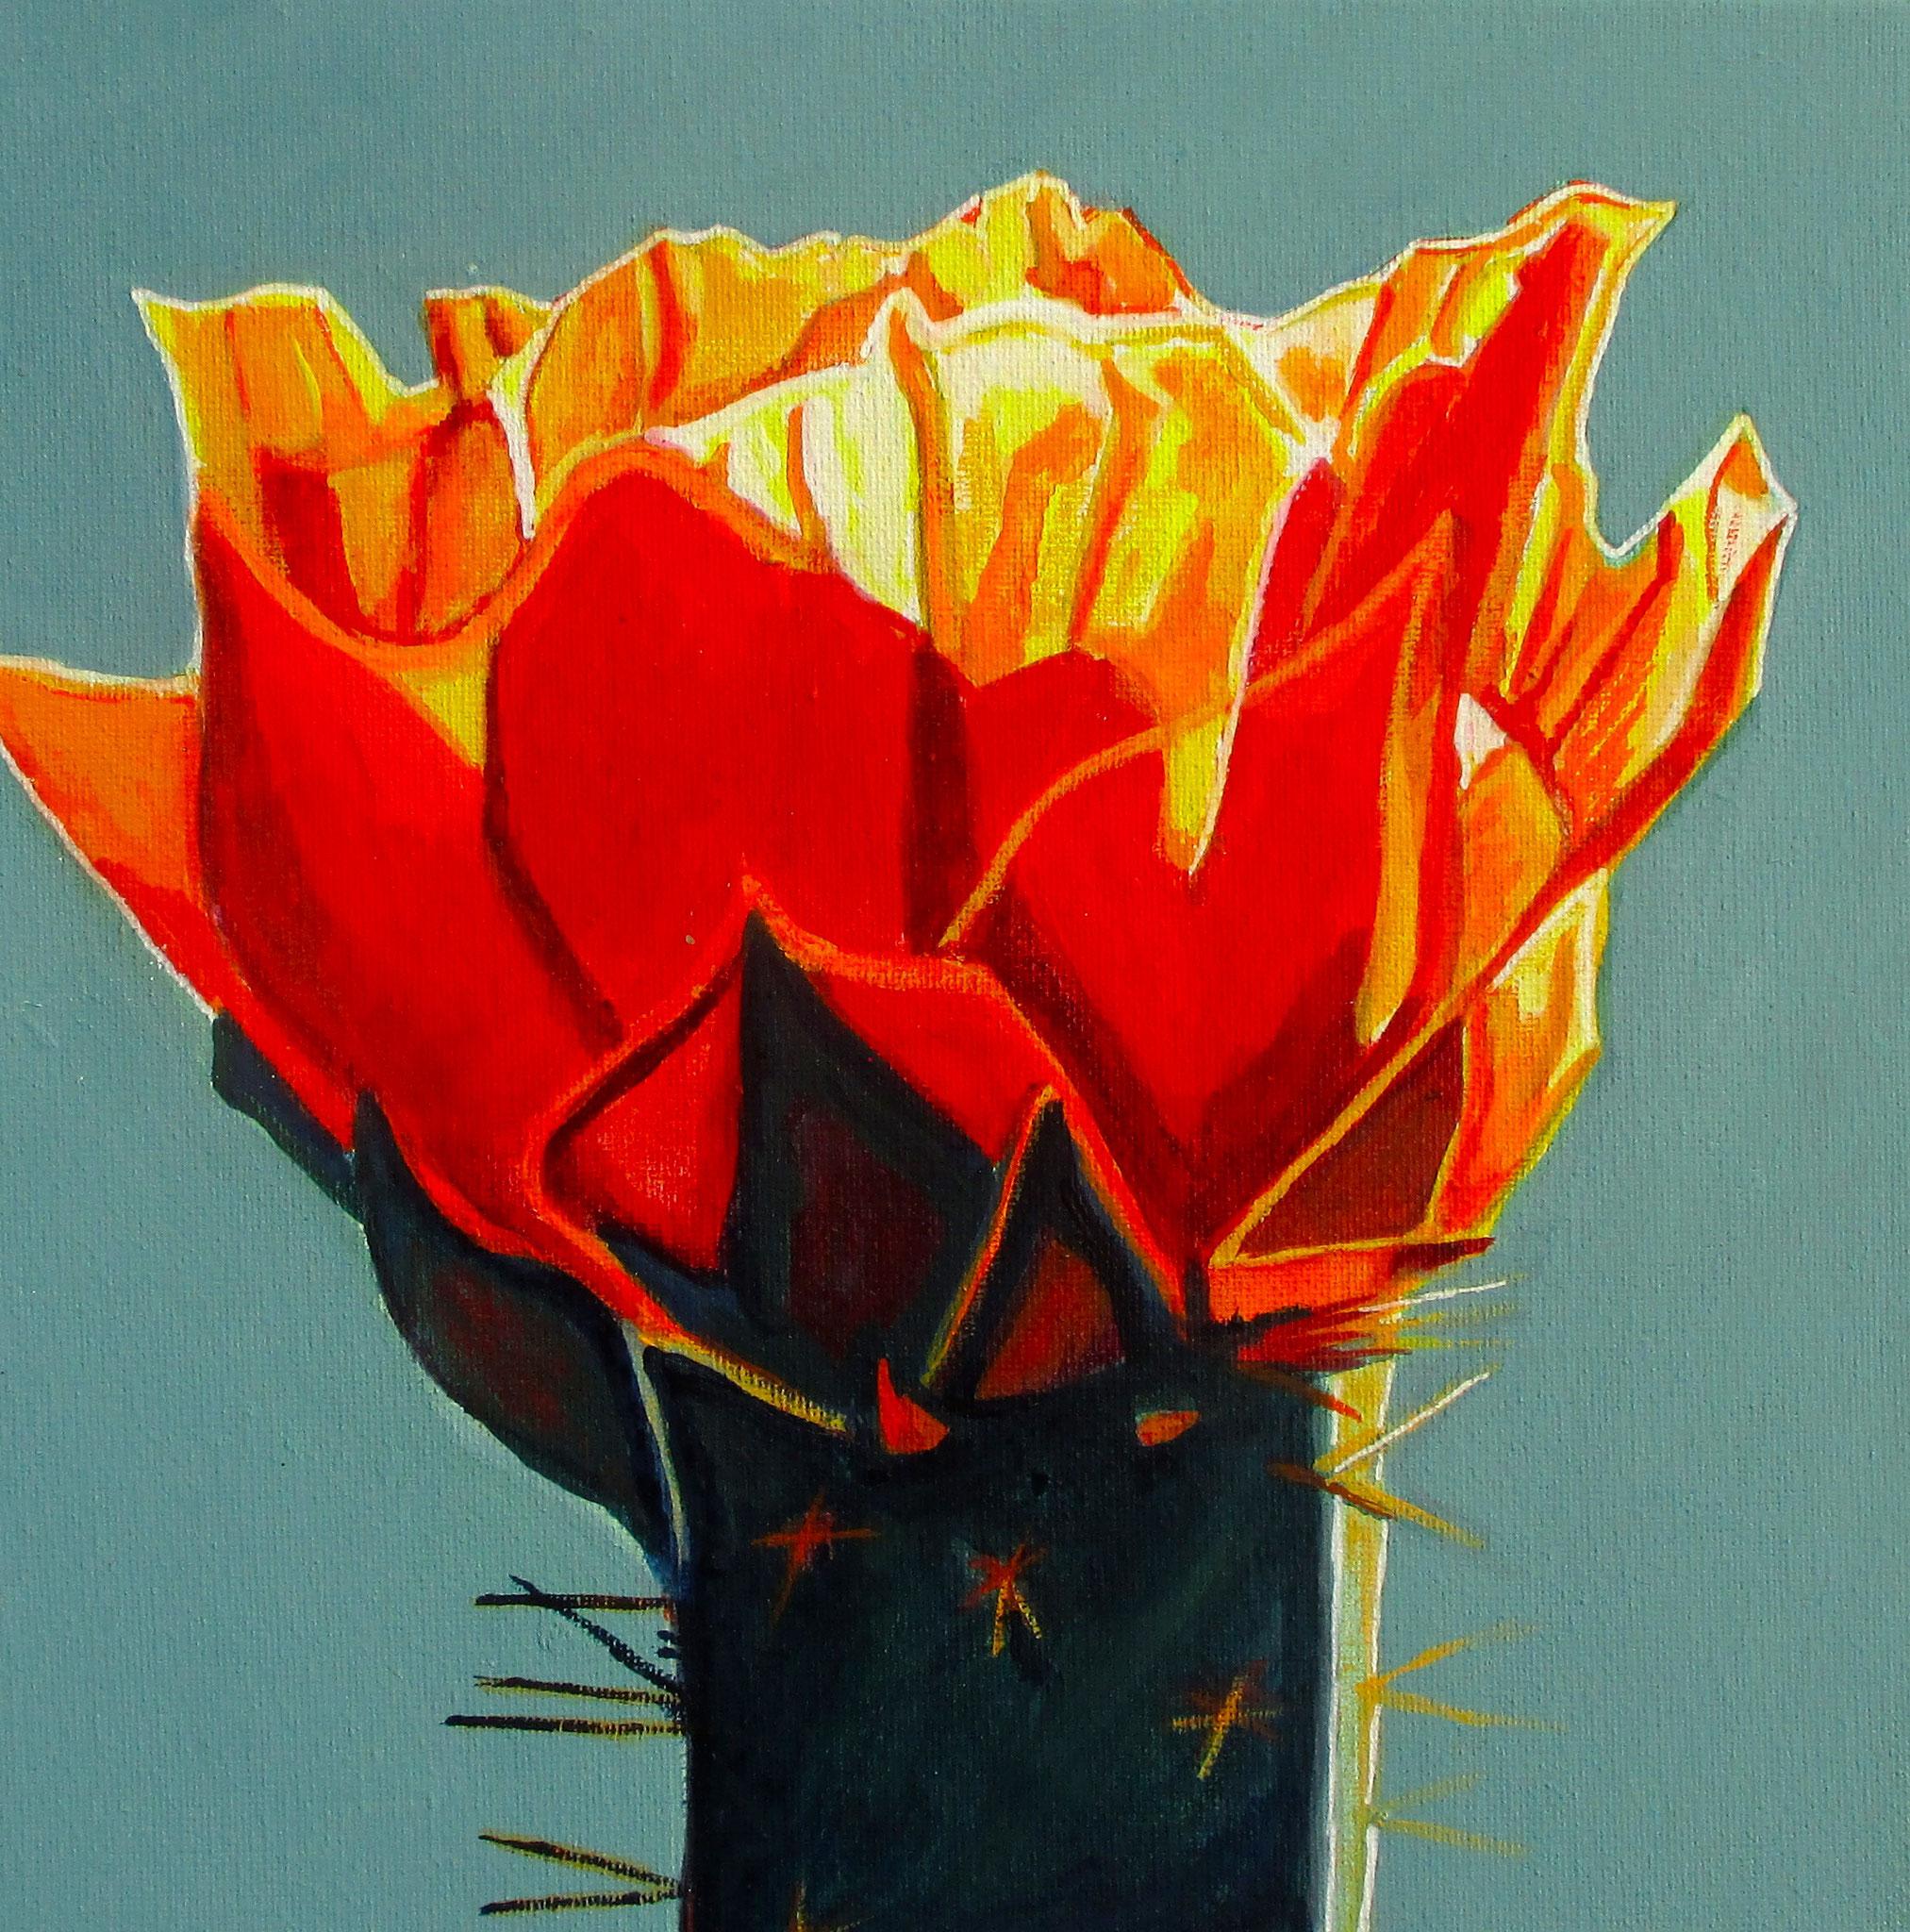 Firecracker Blossom, acrylic on canvas, 10 x 10,  SOLD